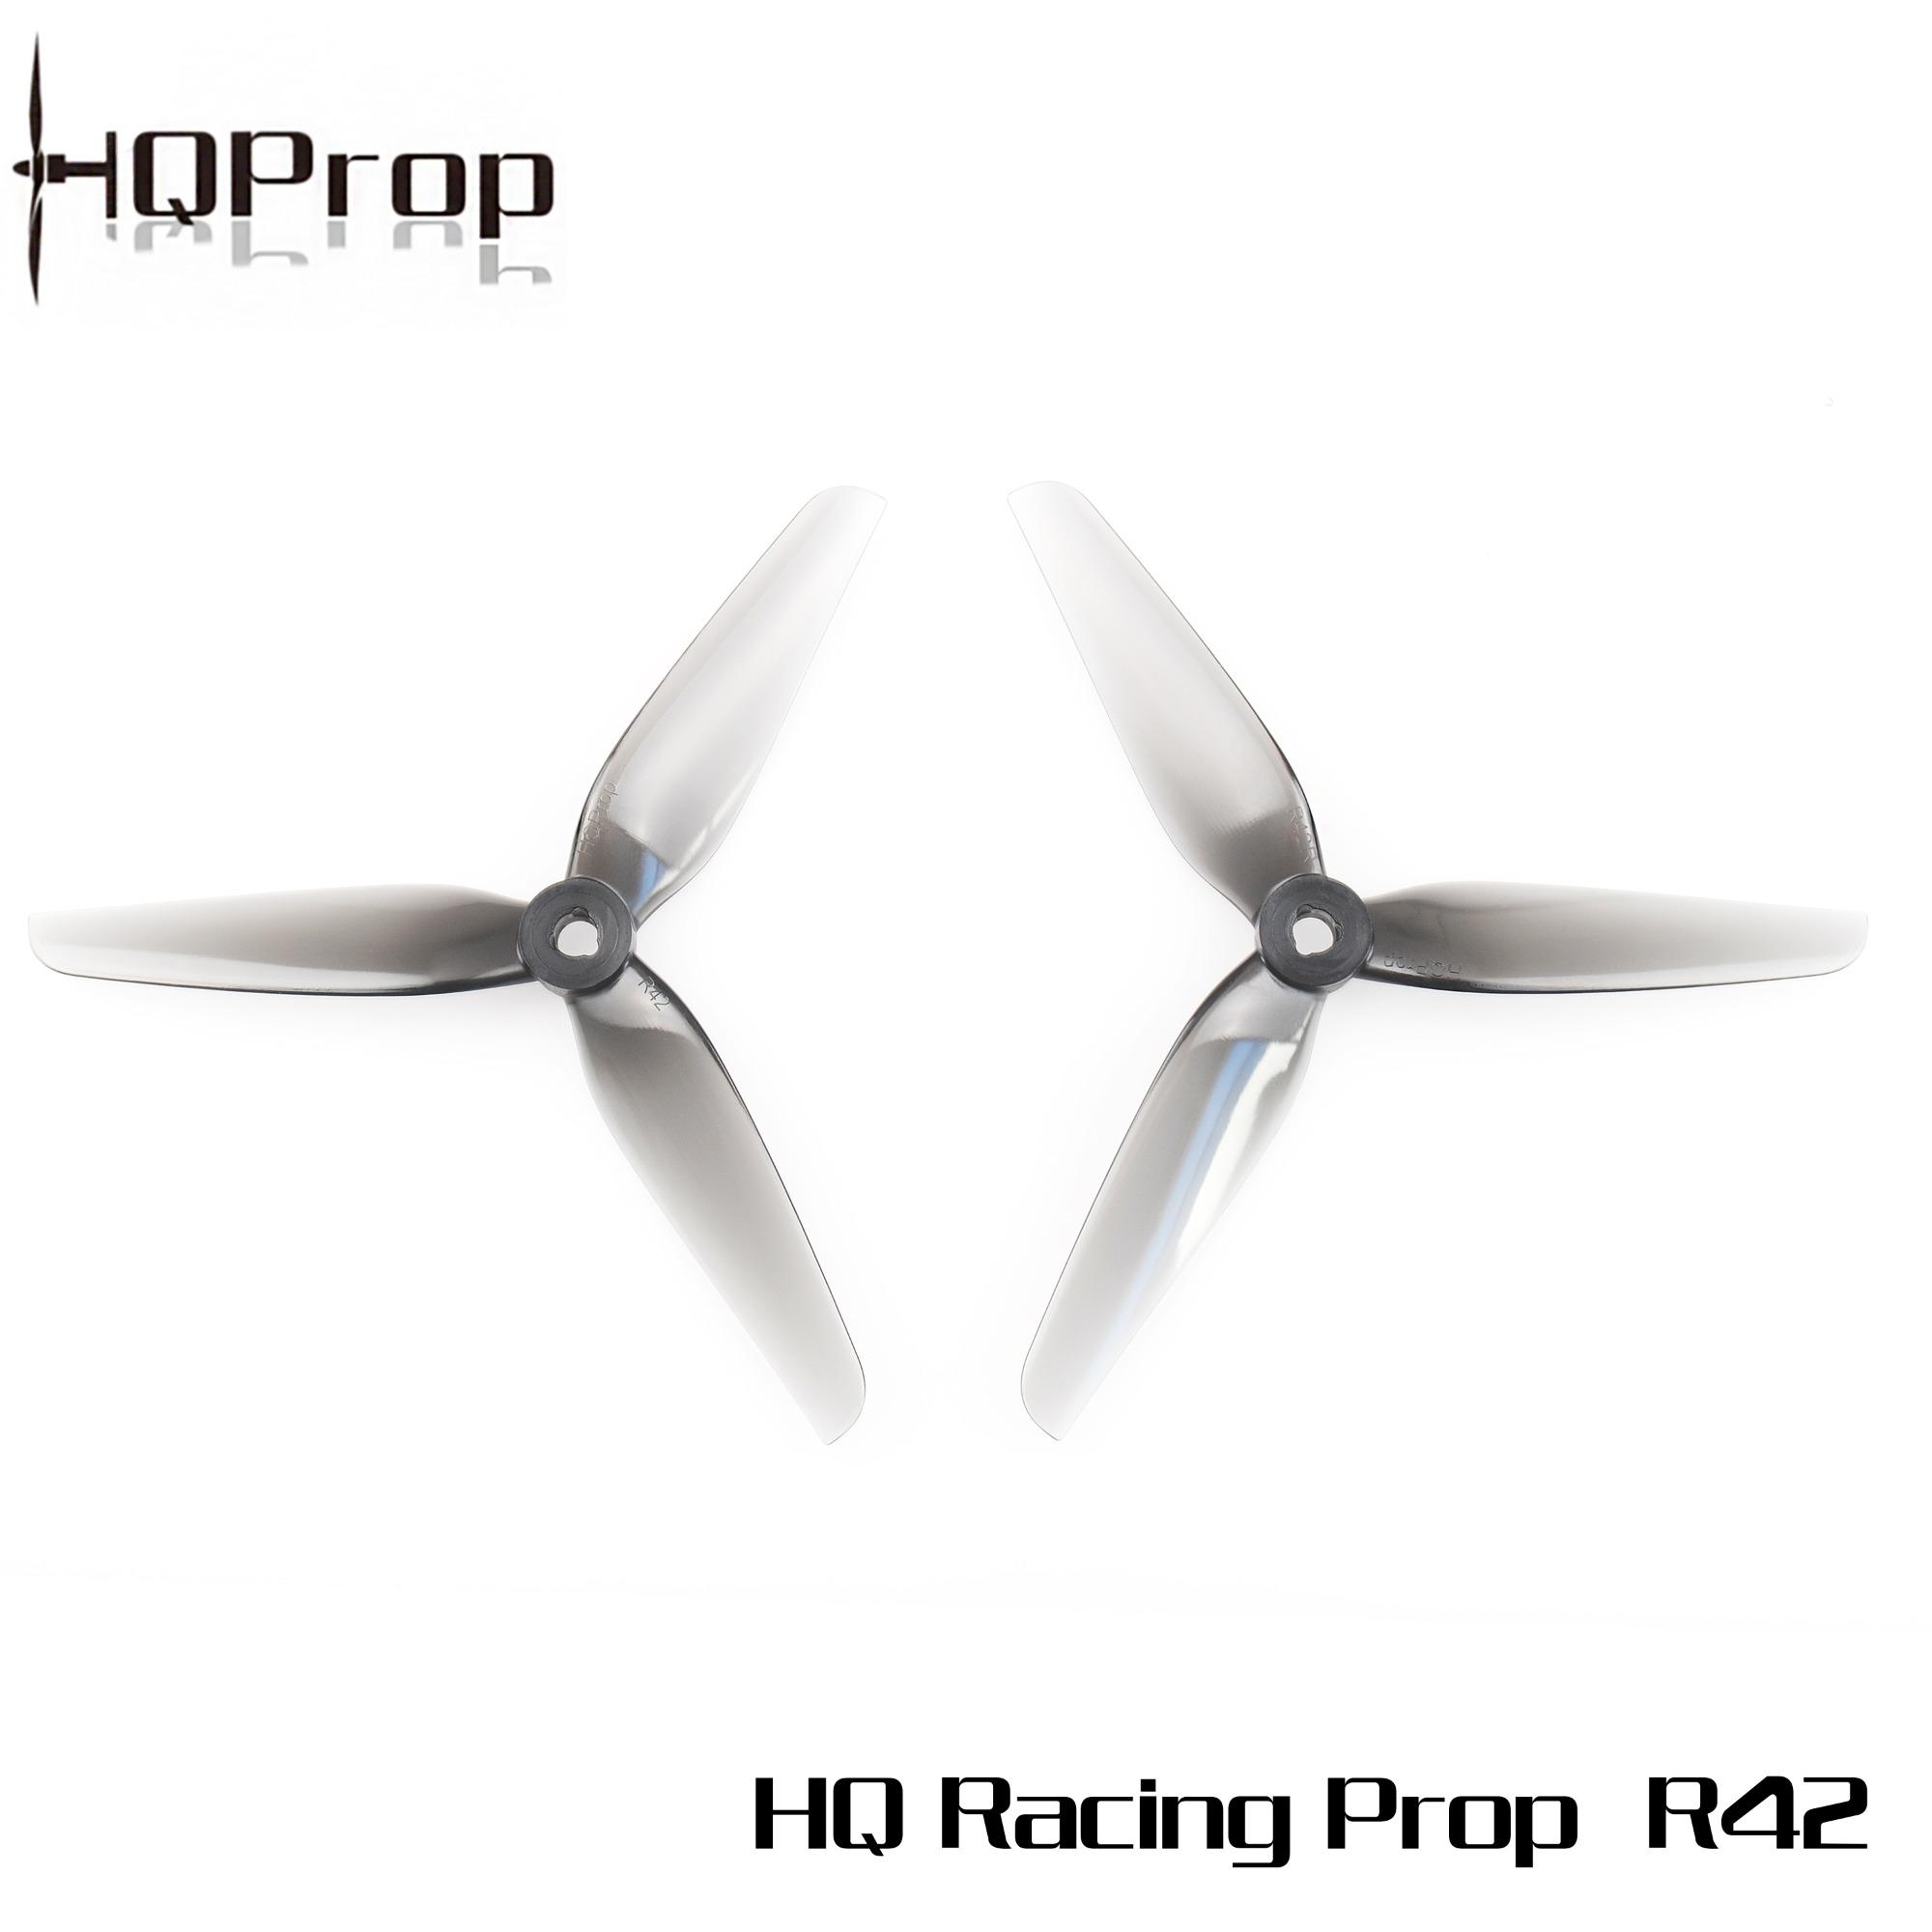 Hélices HQ Racing Prop R42